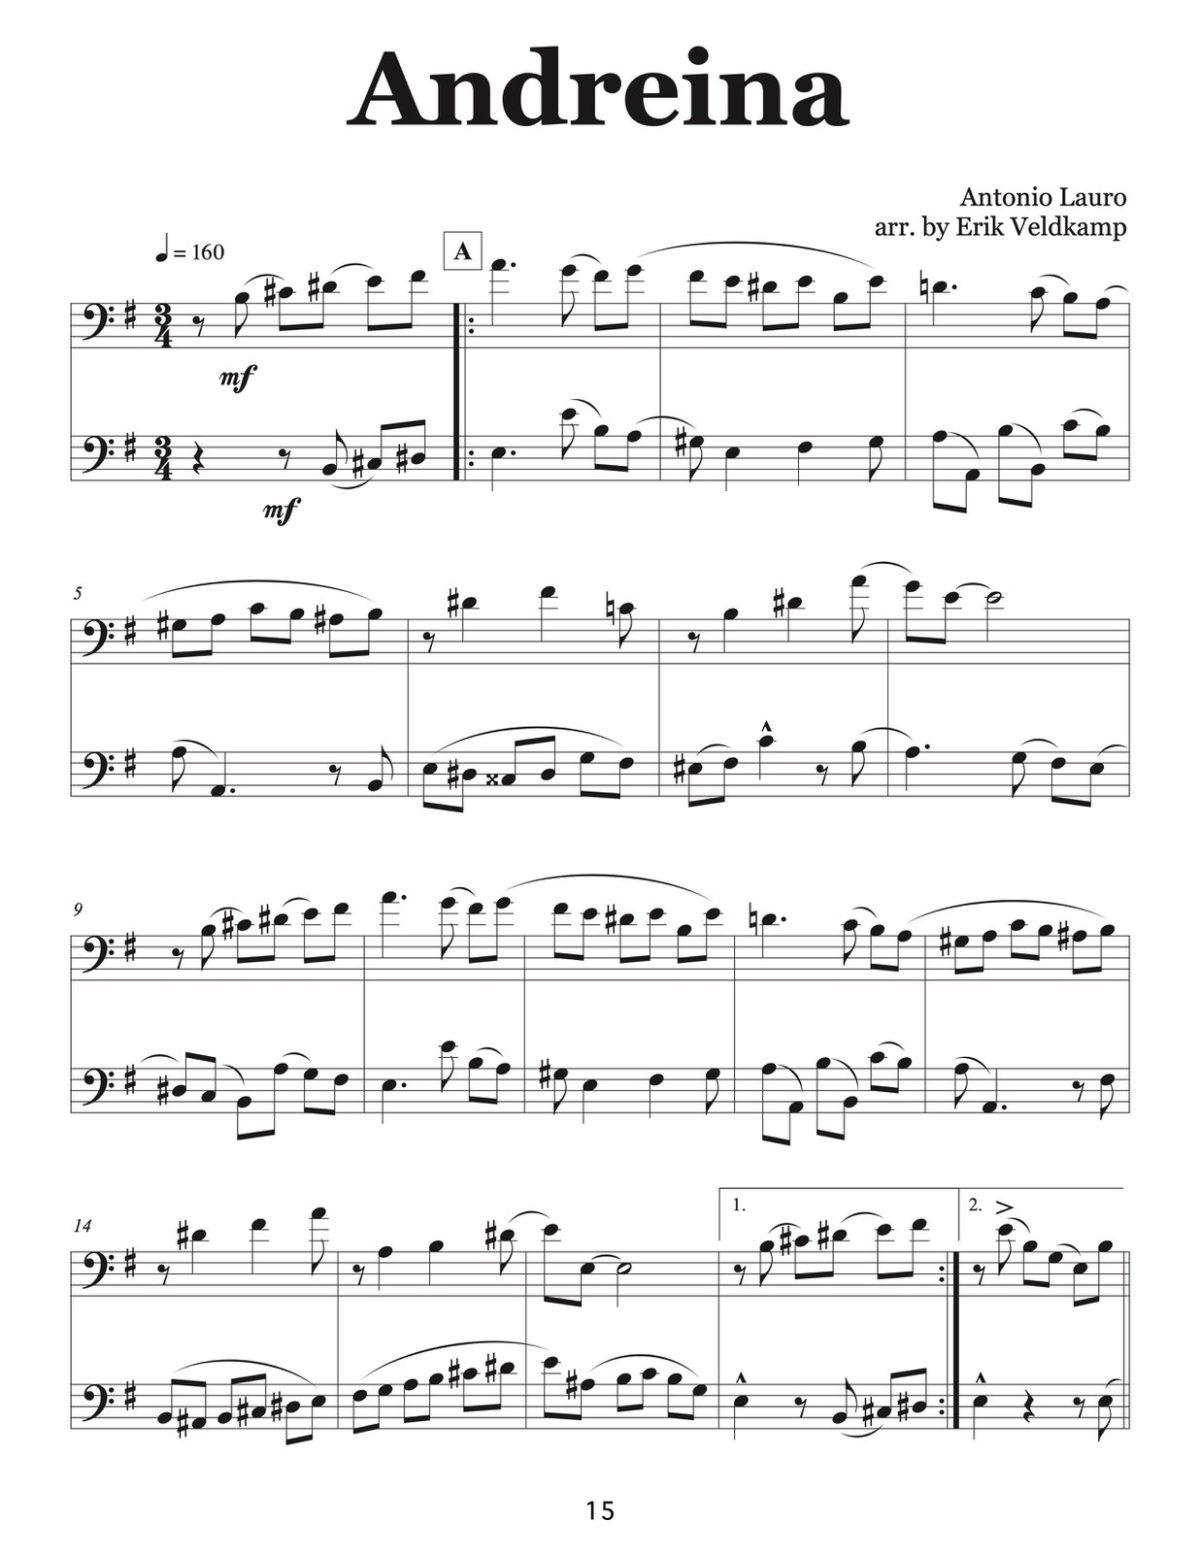 Veldkamp, 16 Venezuelan Waltzes for Trombone-p17